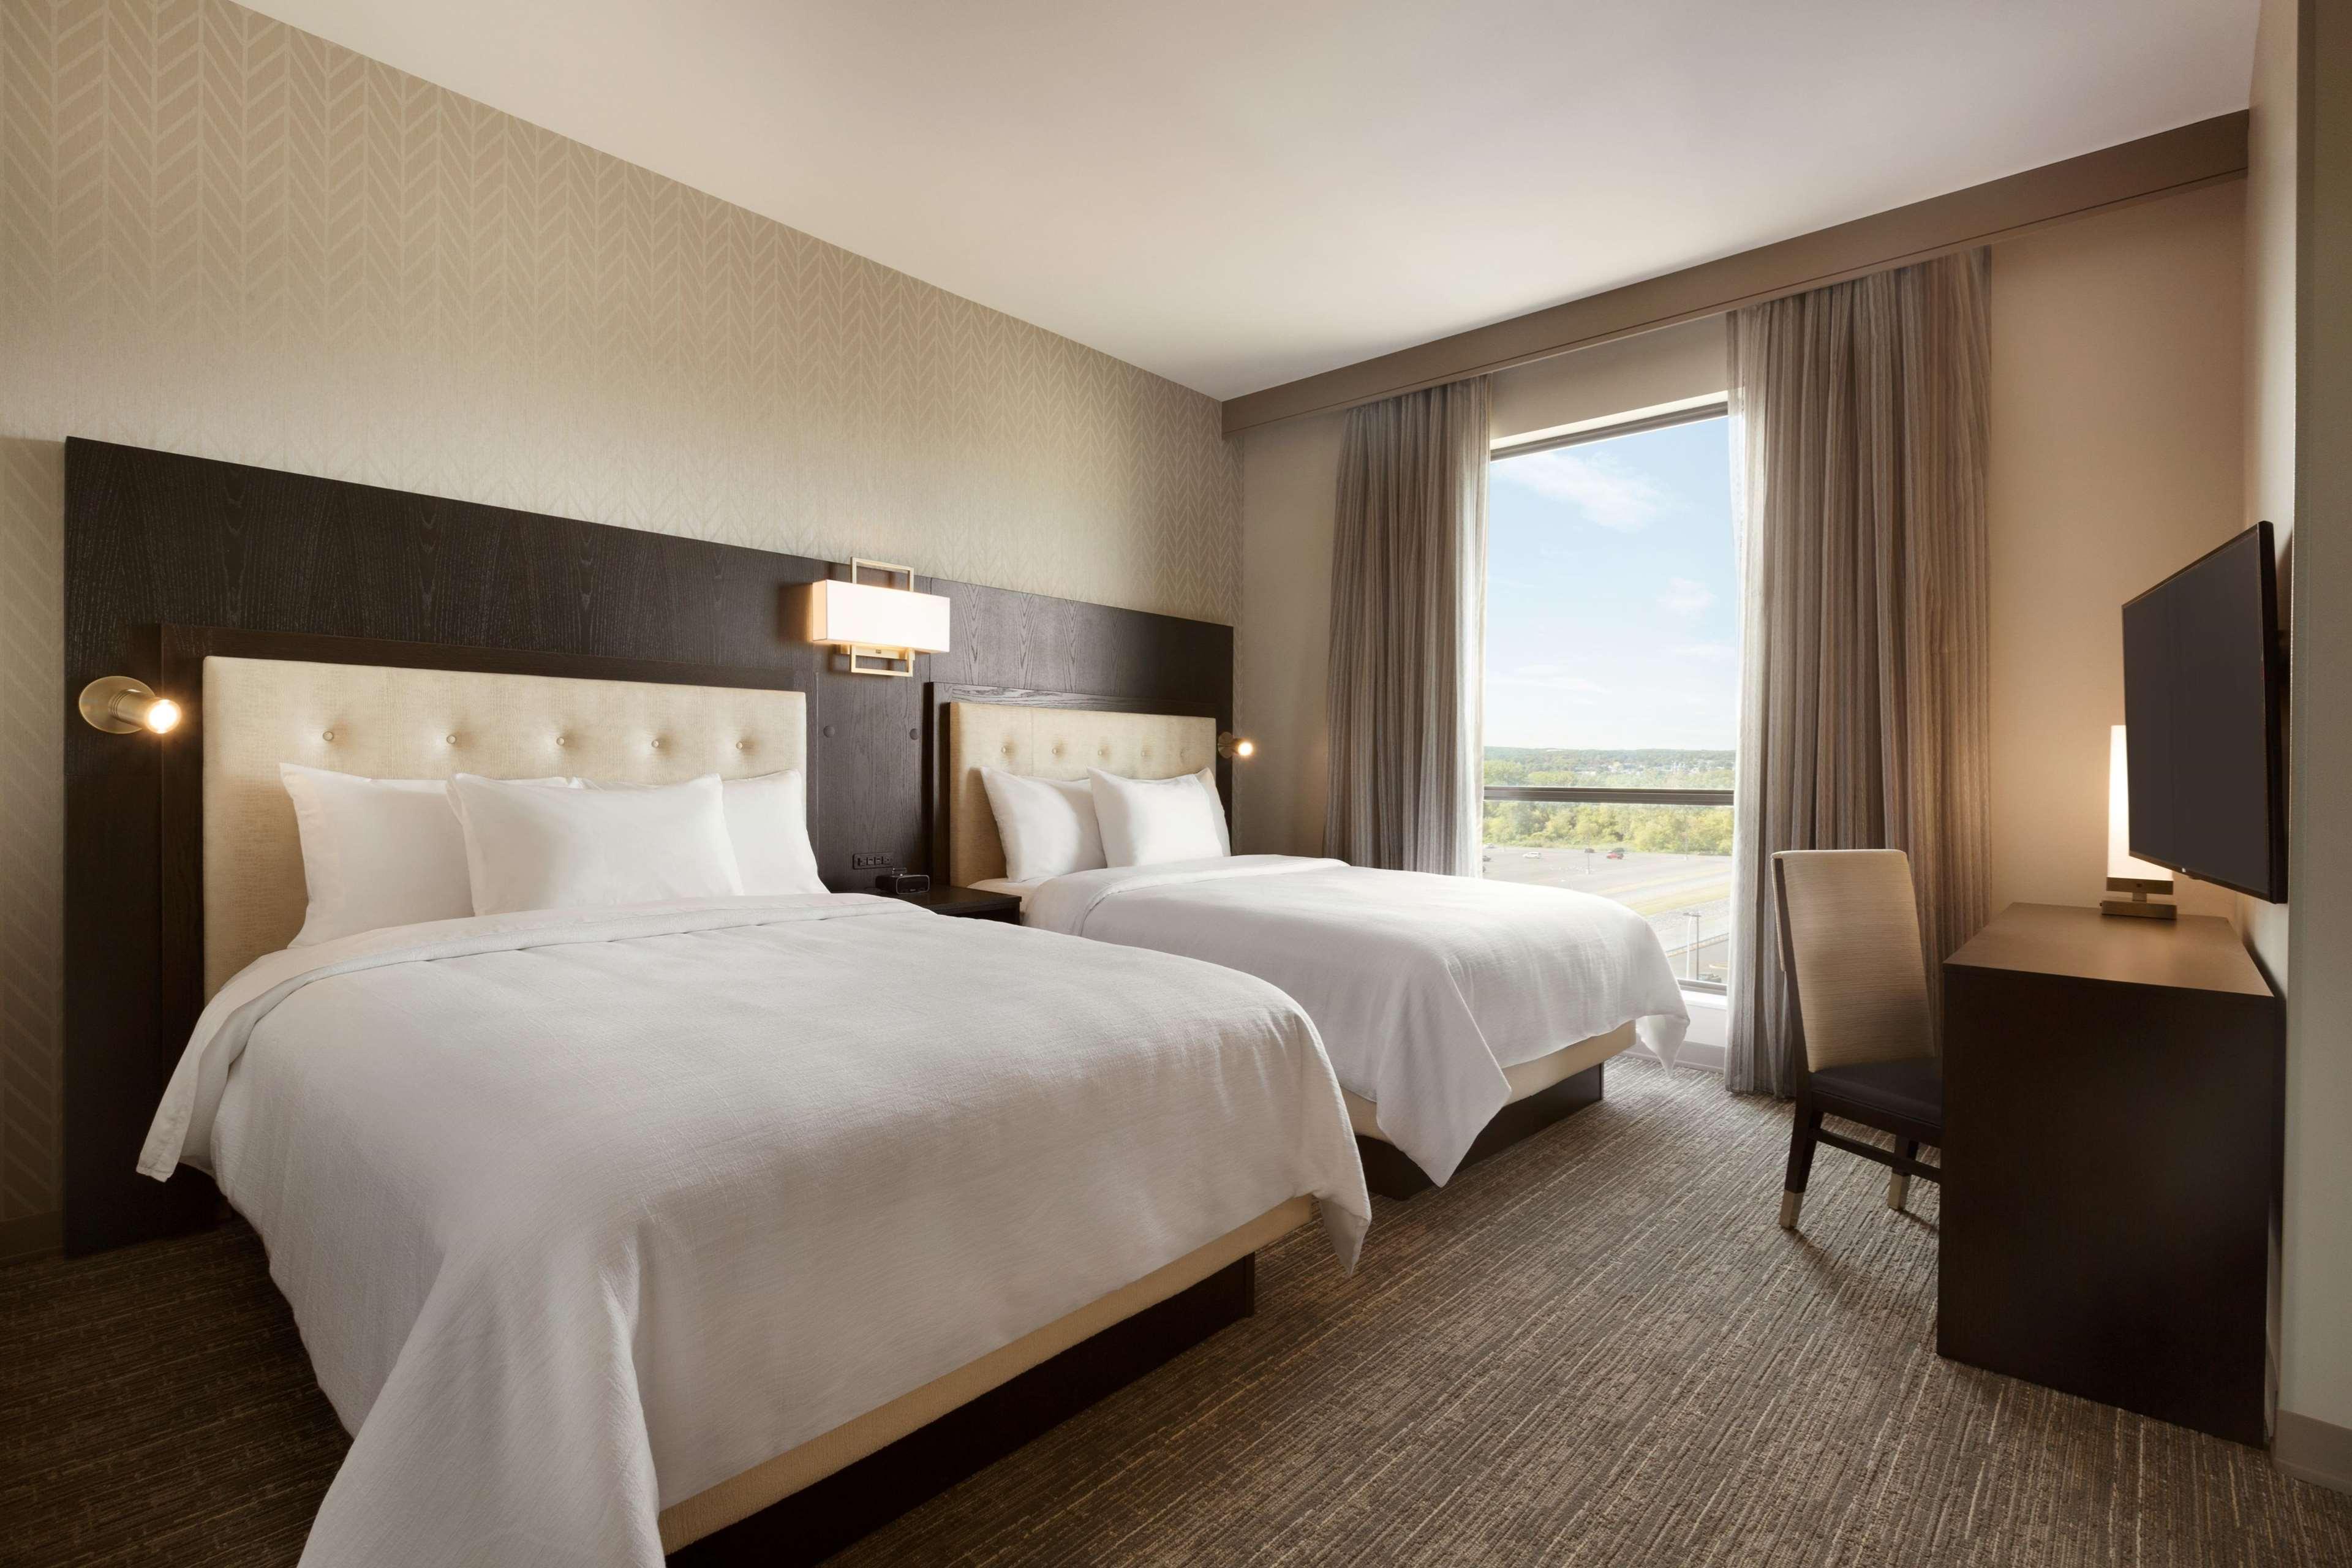 Embassy Suites by Hilton Syracuse Destiny USA image 11